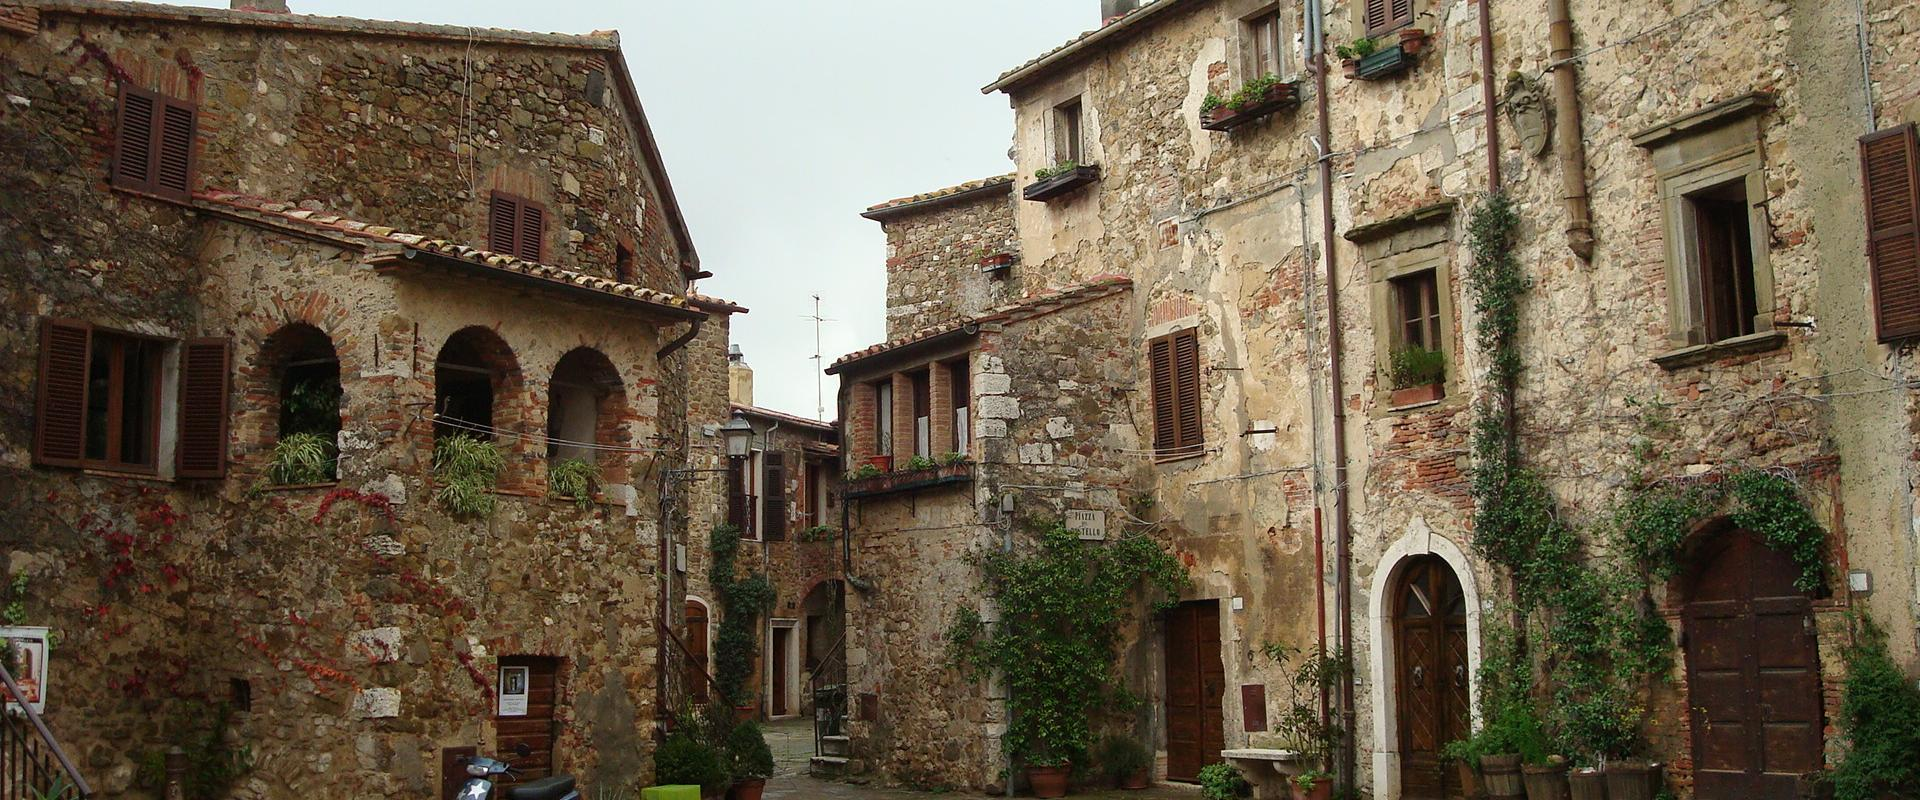 Visit of Montemerano Tuscany